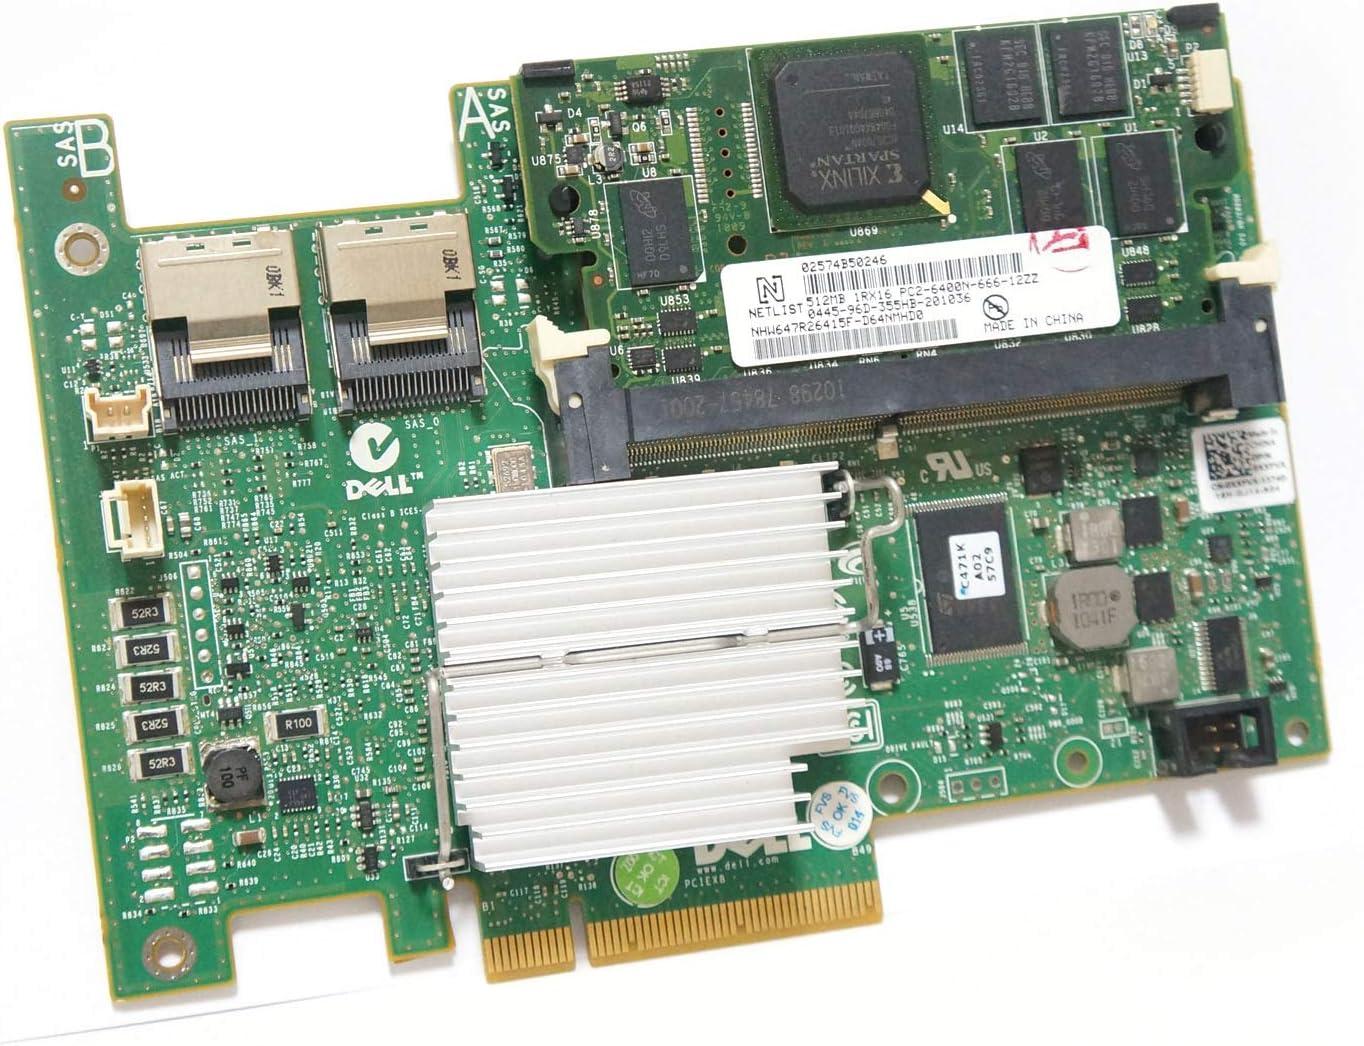 POINWER H700 KK67X R374M CNXVV H700i 0KK67X CN-0KK67X Replacement for Dell PERC 2 Internal Mini SAS Connectors PCI Express Raid Controller Card